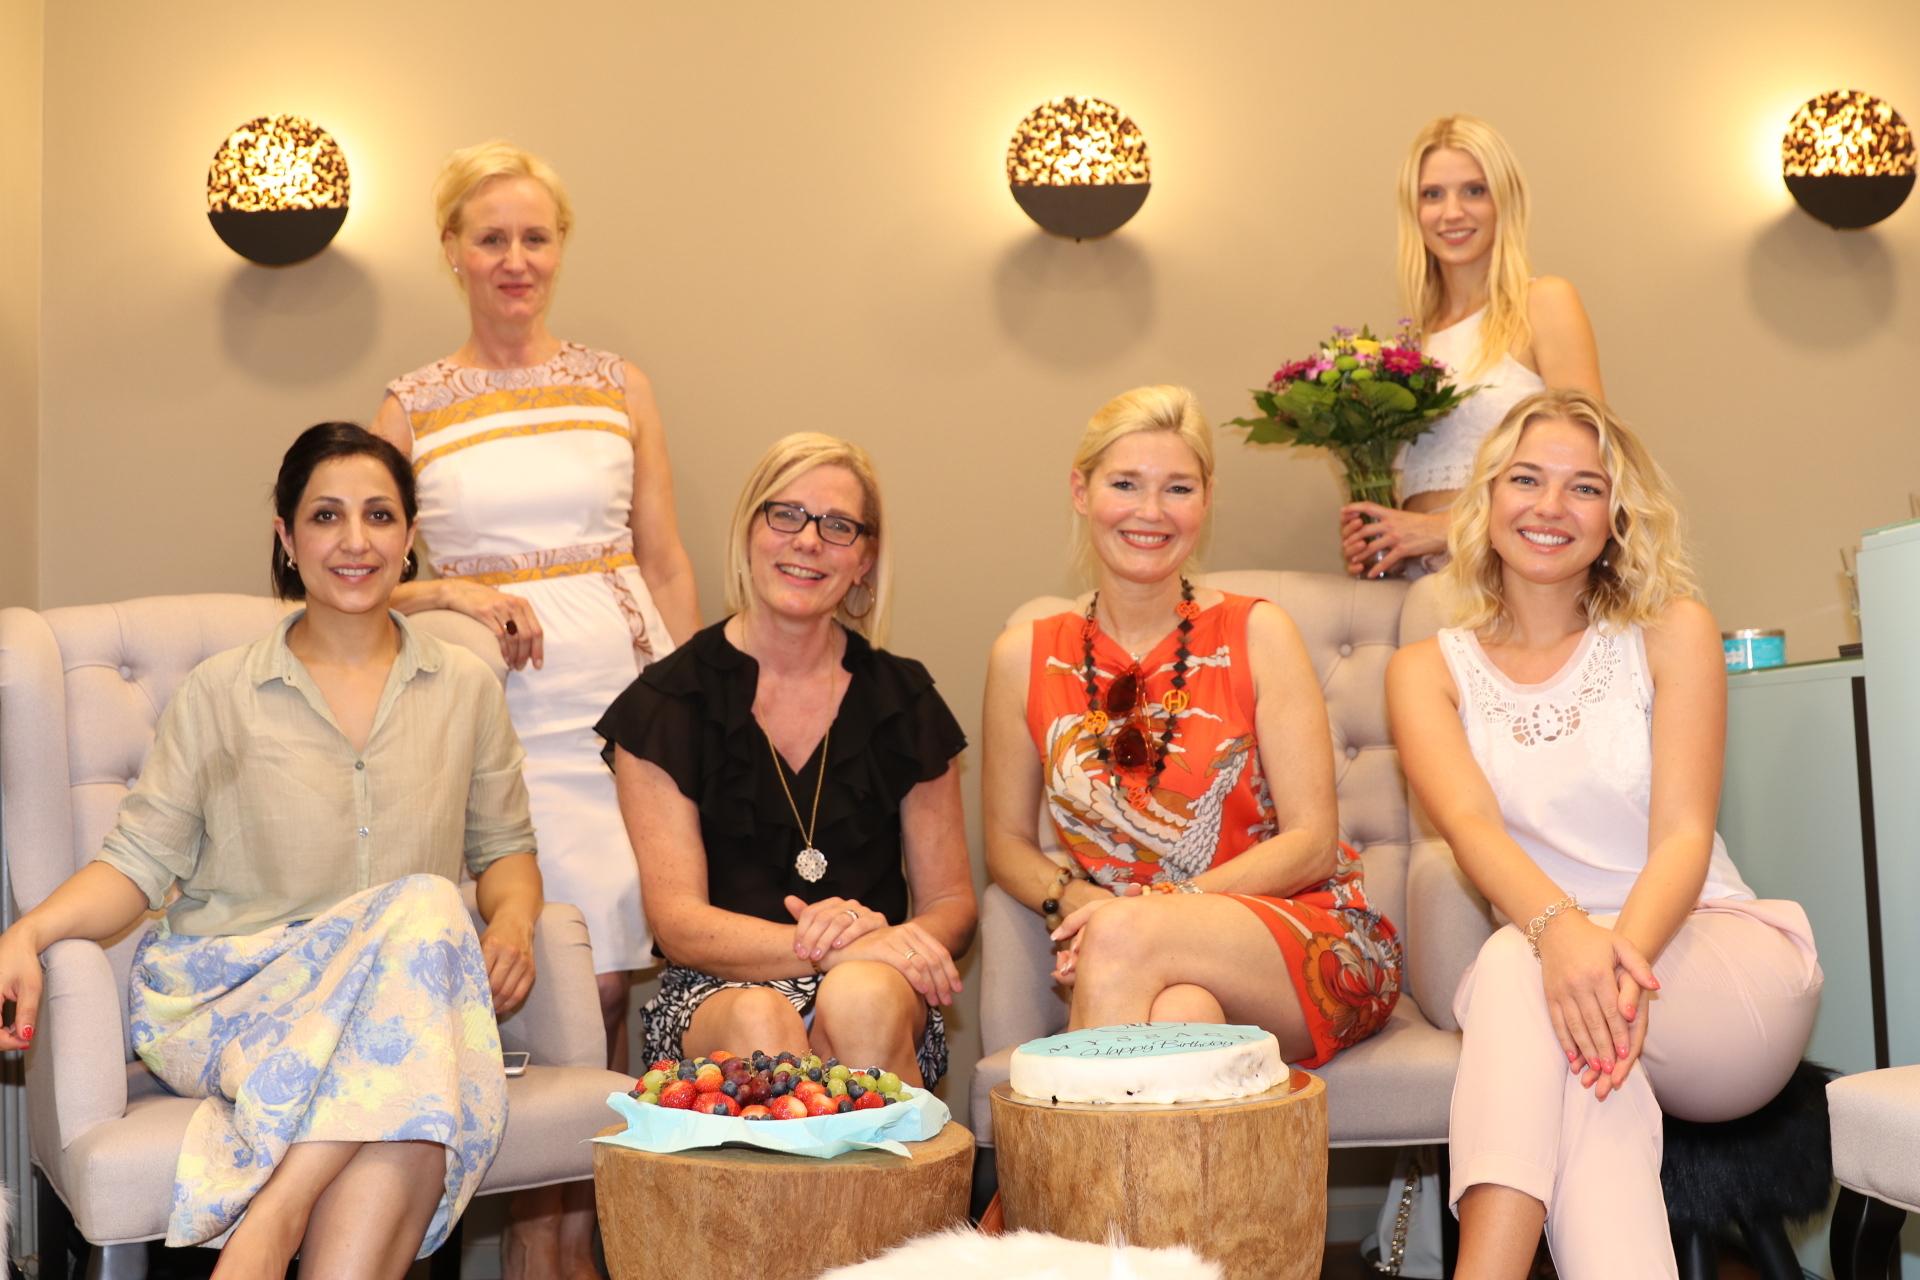 Myssage Damentreff, Laila Hamidi, Marion Bock, Gudrun Garces, Petra Dieners, Carina Birnbacher, Stefanie Seiffert, Lifestyle-Blog, Lieblingsstil.com,